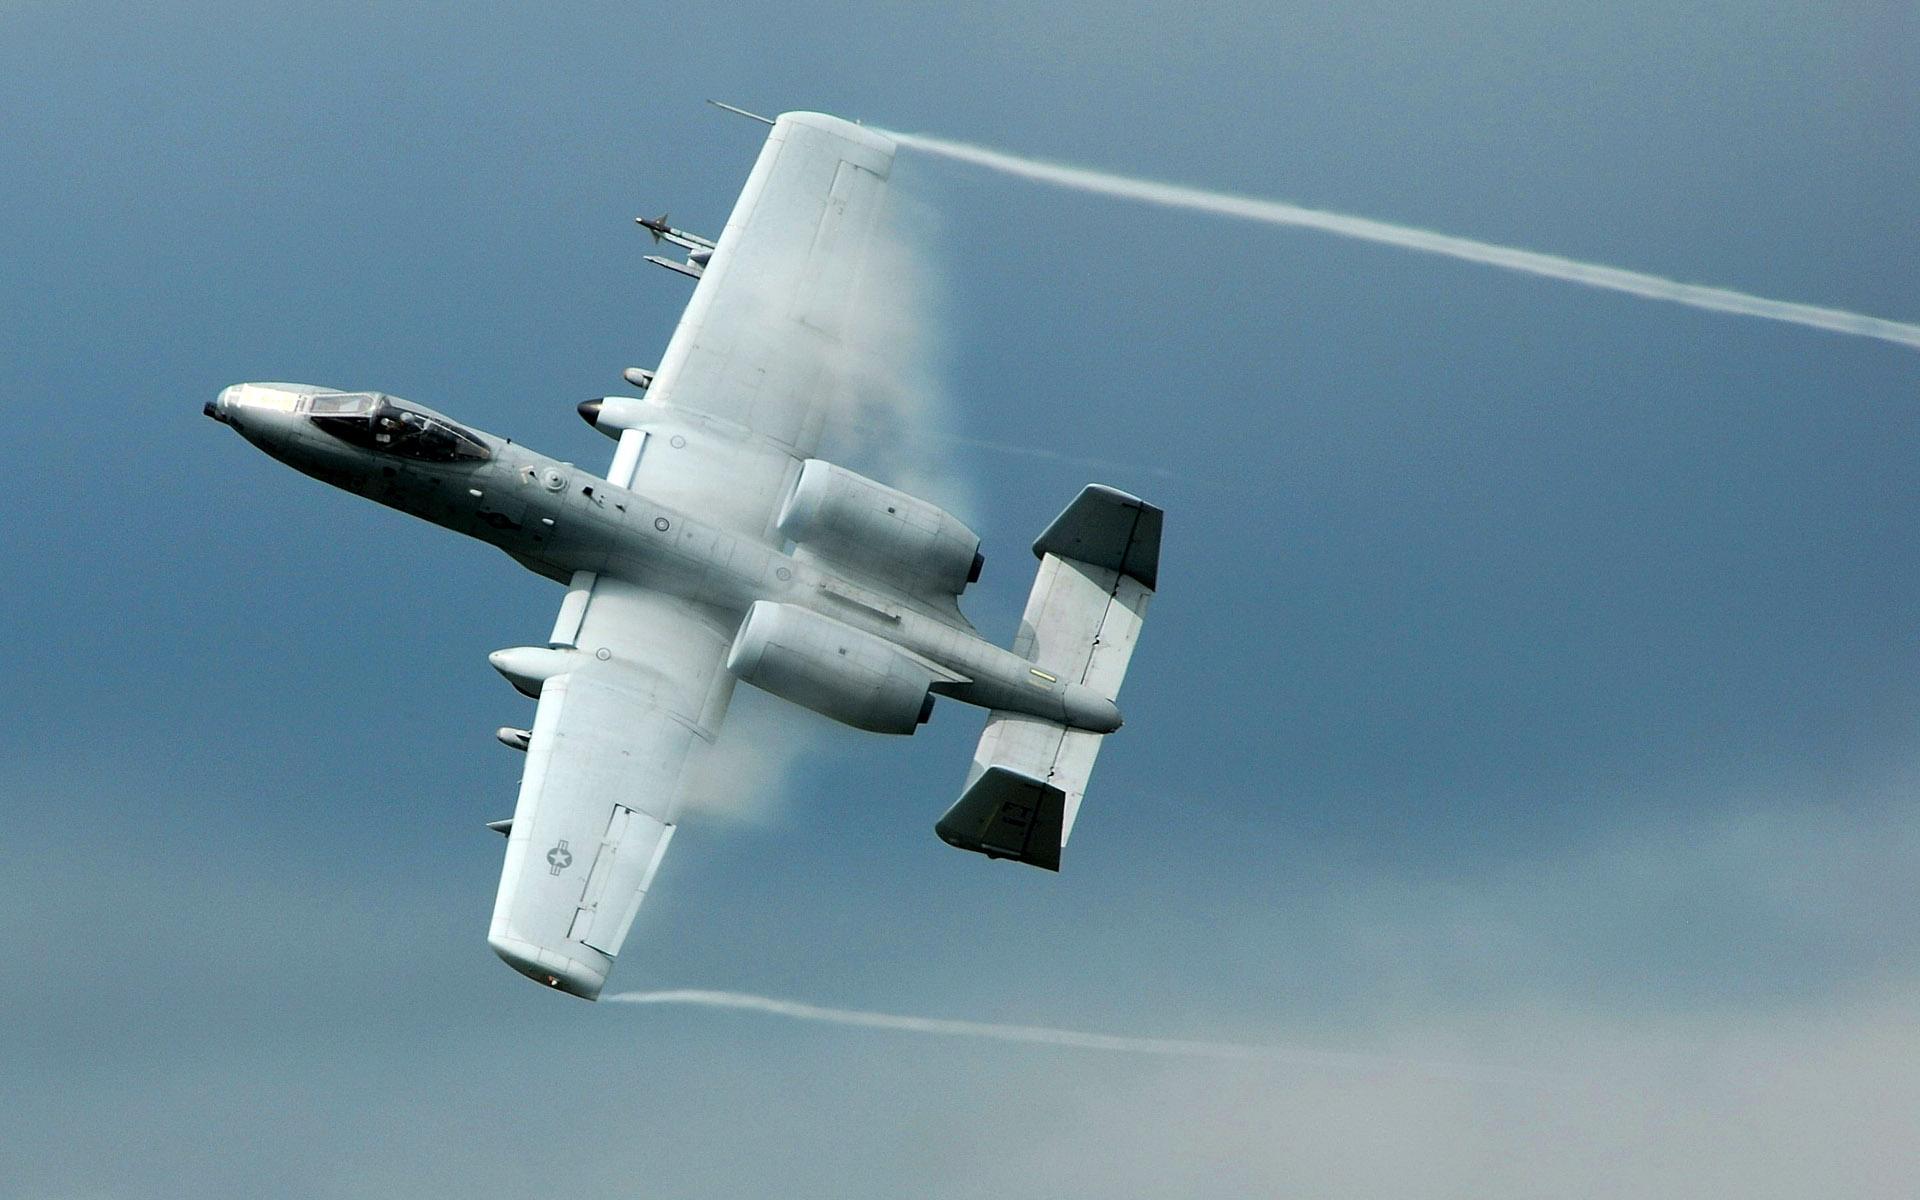 El avión A-10 Thunderbolt - 1920x1200